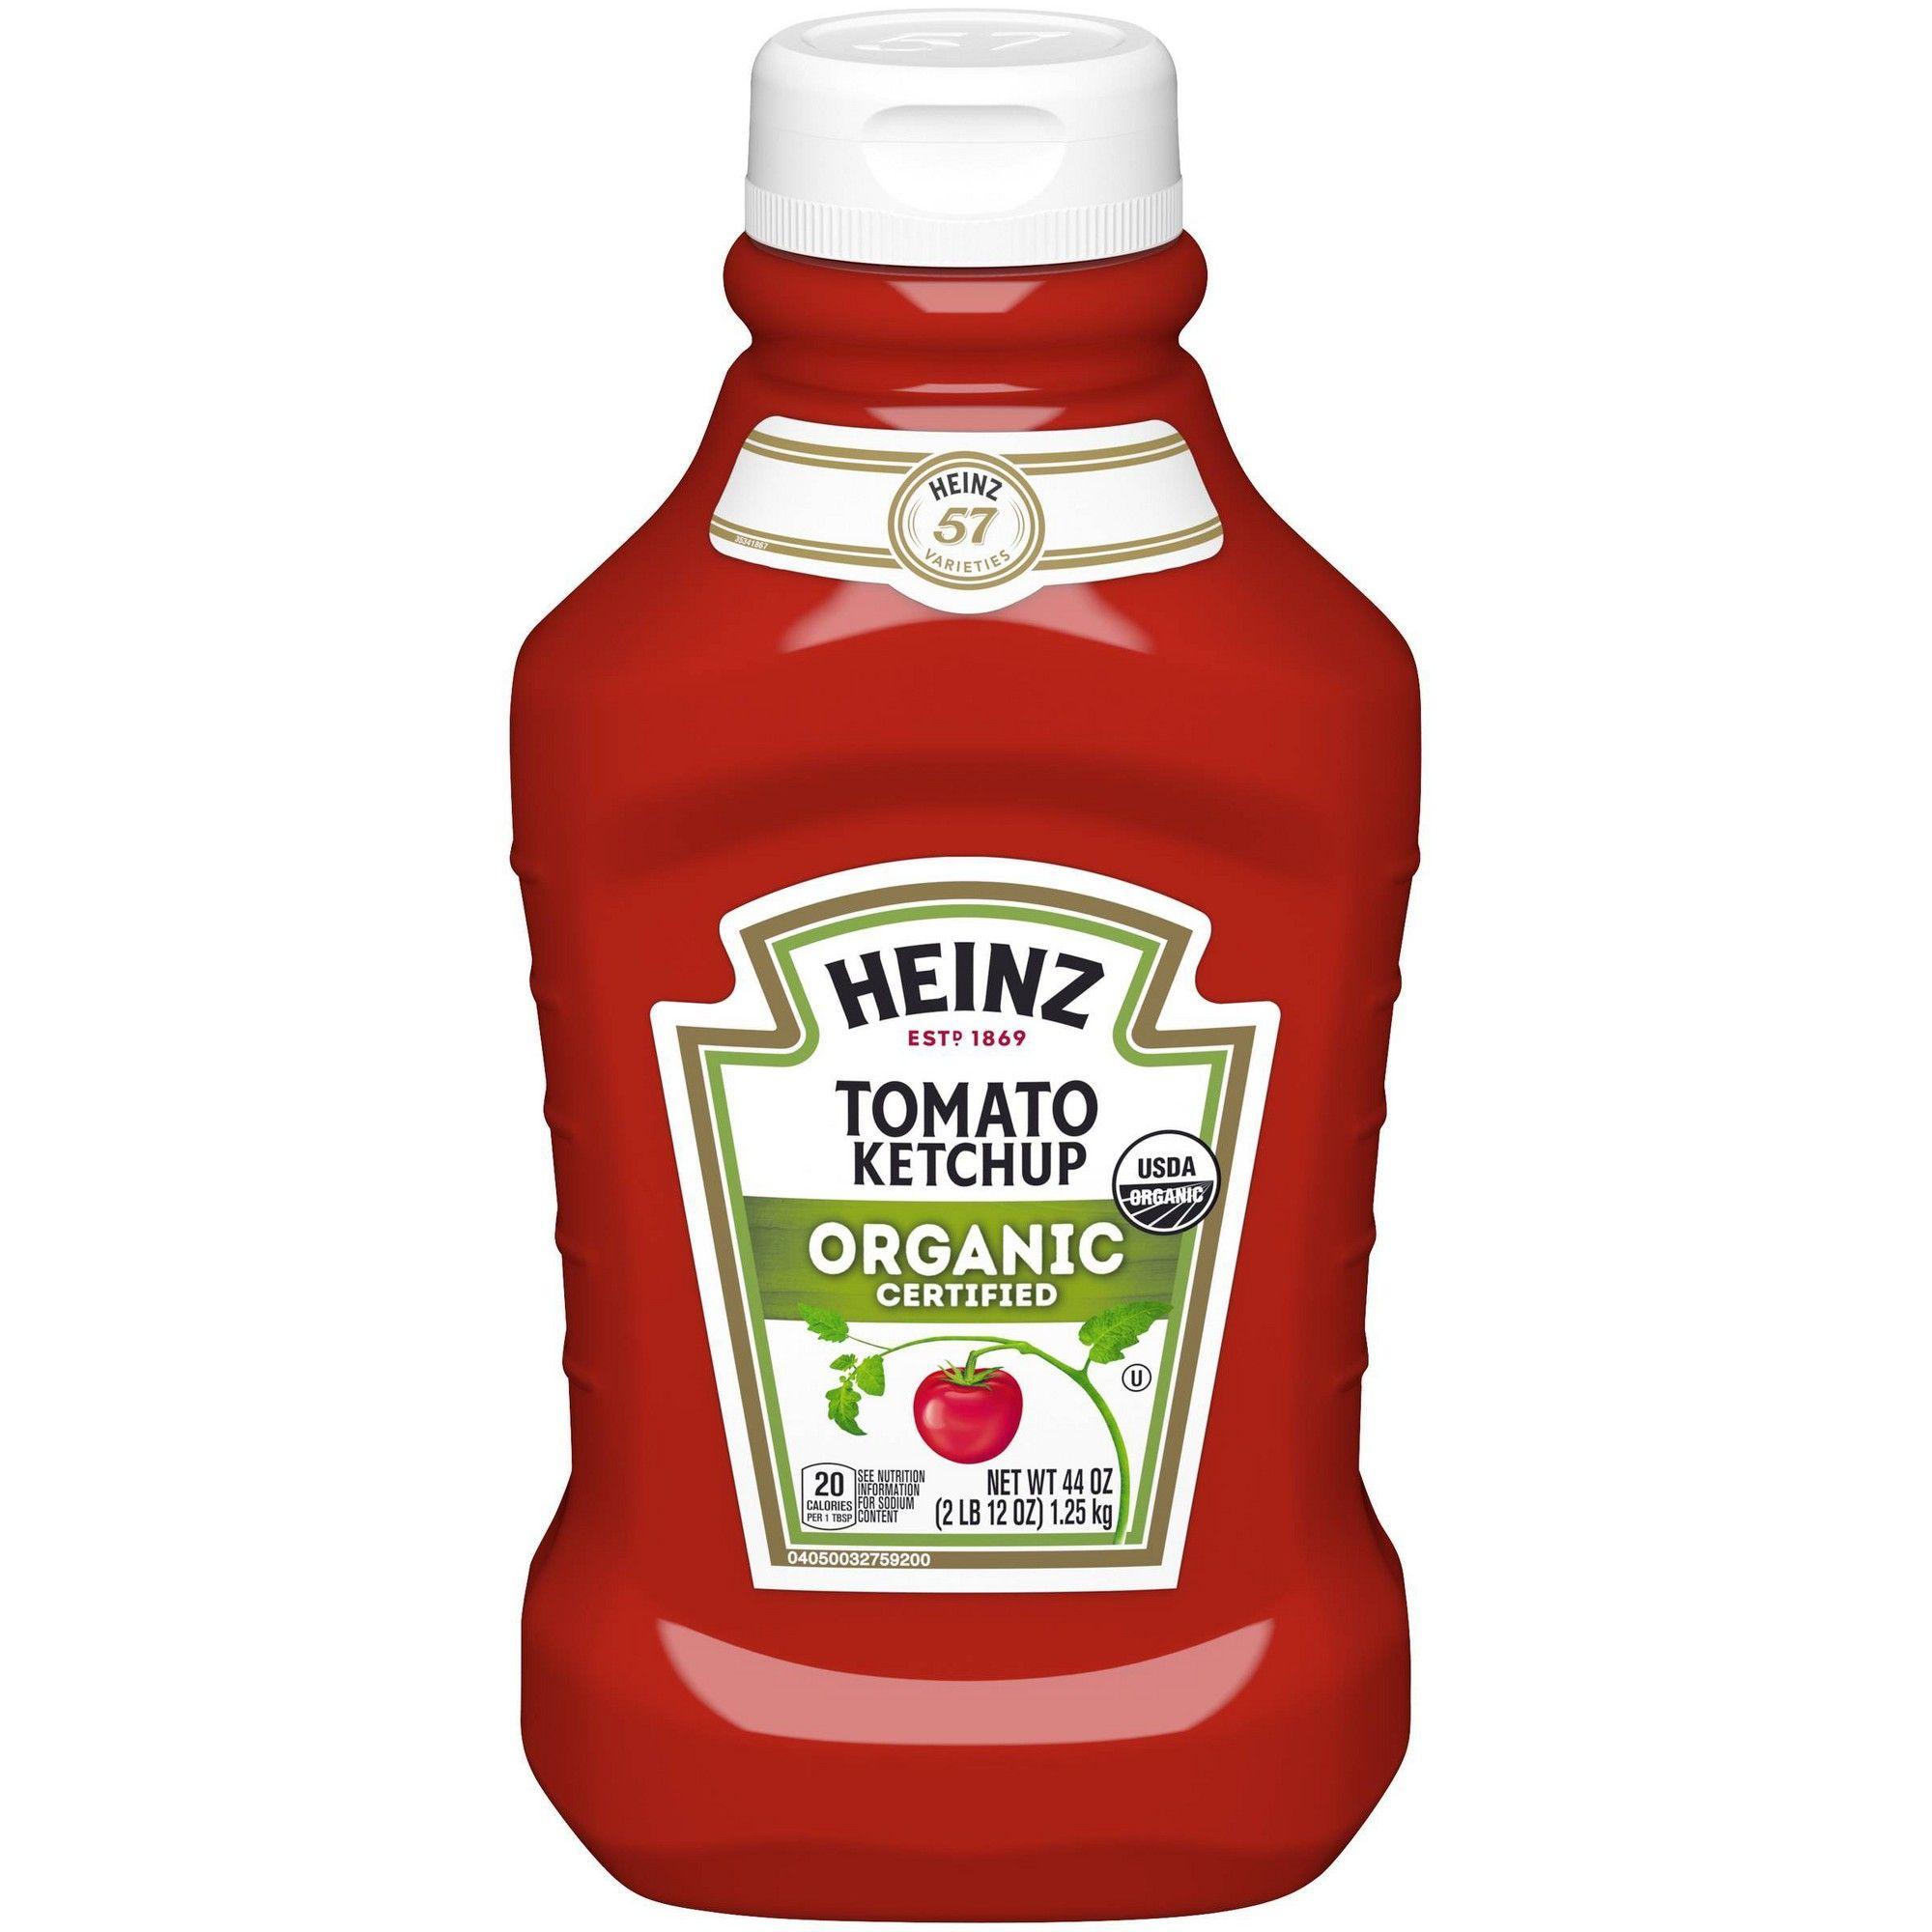 Heinz organic ketchup 44oz tomato ketchup ketchup